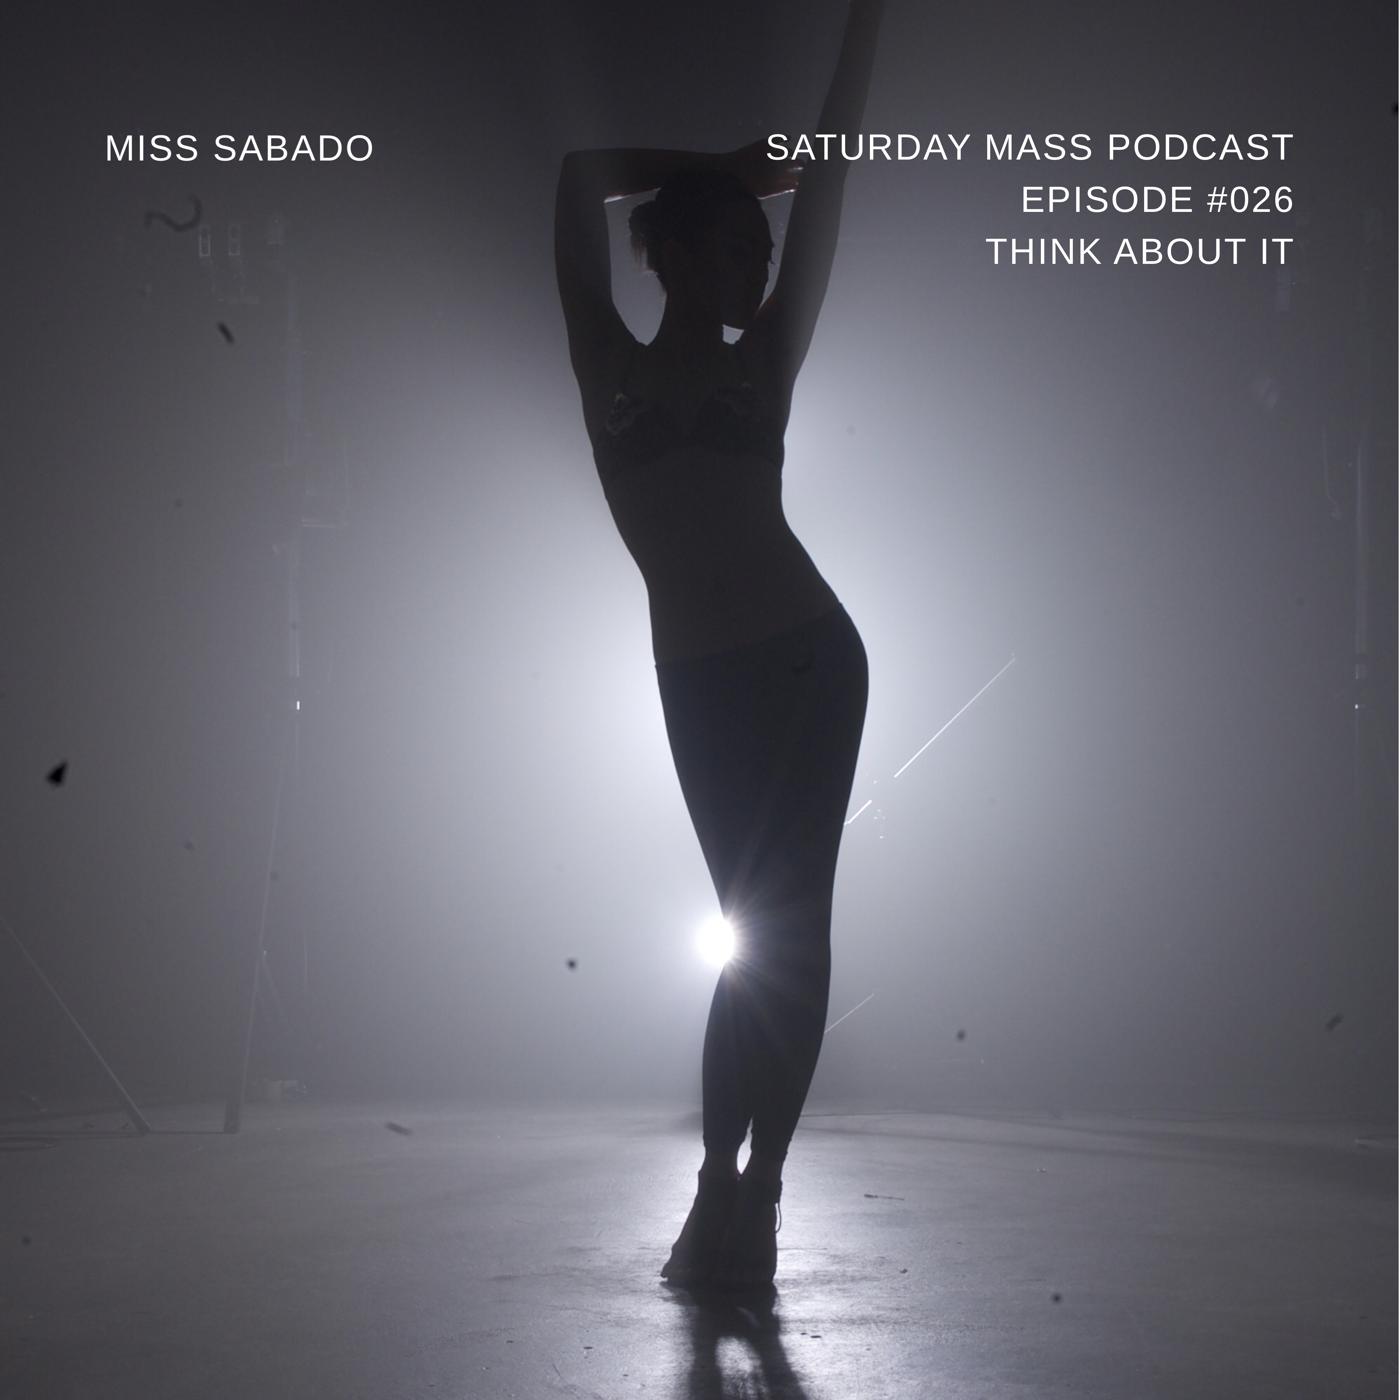 SATURDAY MASS PODCAST - SERMON #026: THINK ABOUT IT